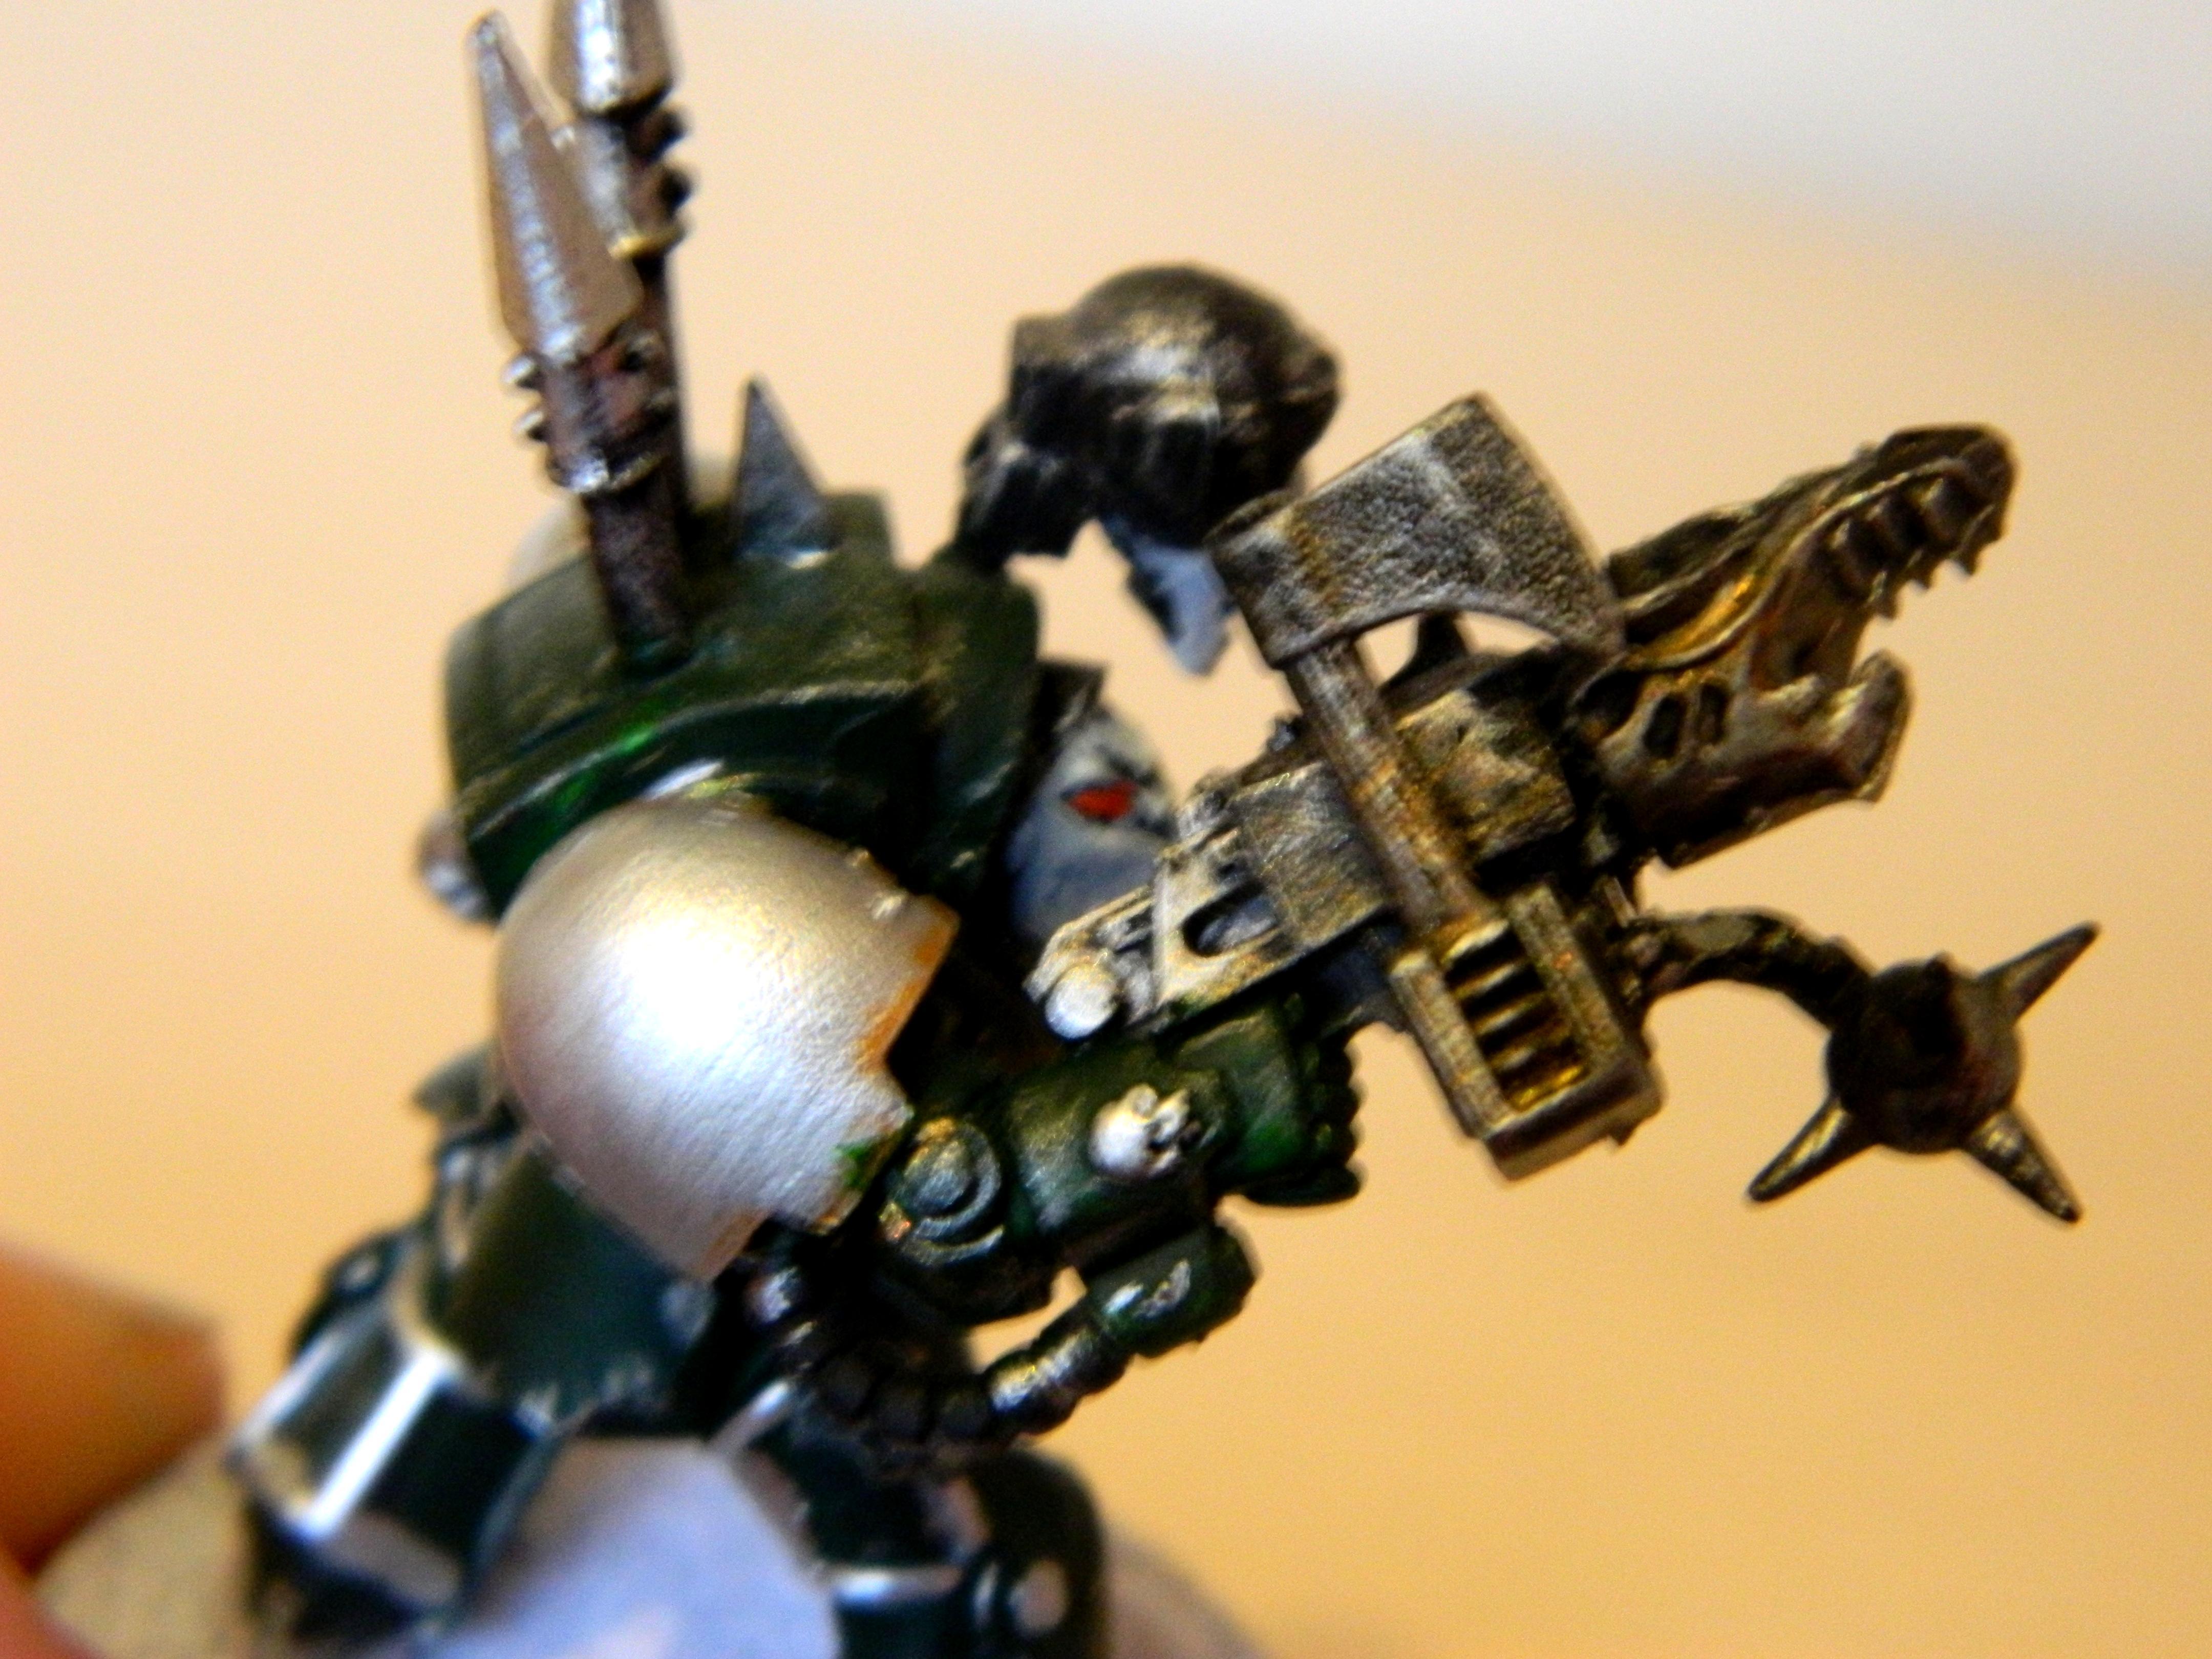 Alpha, Chaos, Chaos Space Marines, Conversion, Terminator Armor, Warhammer 40,000